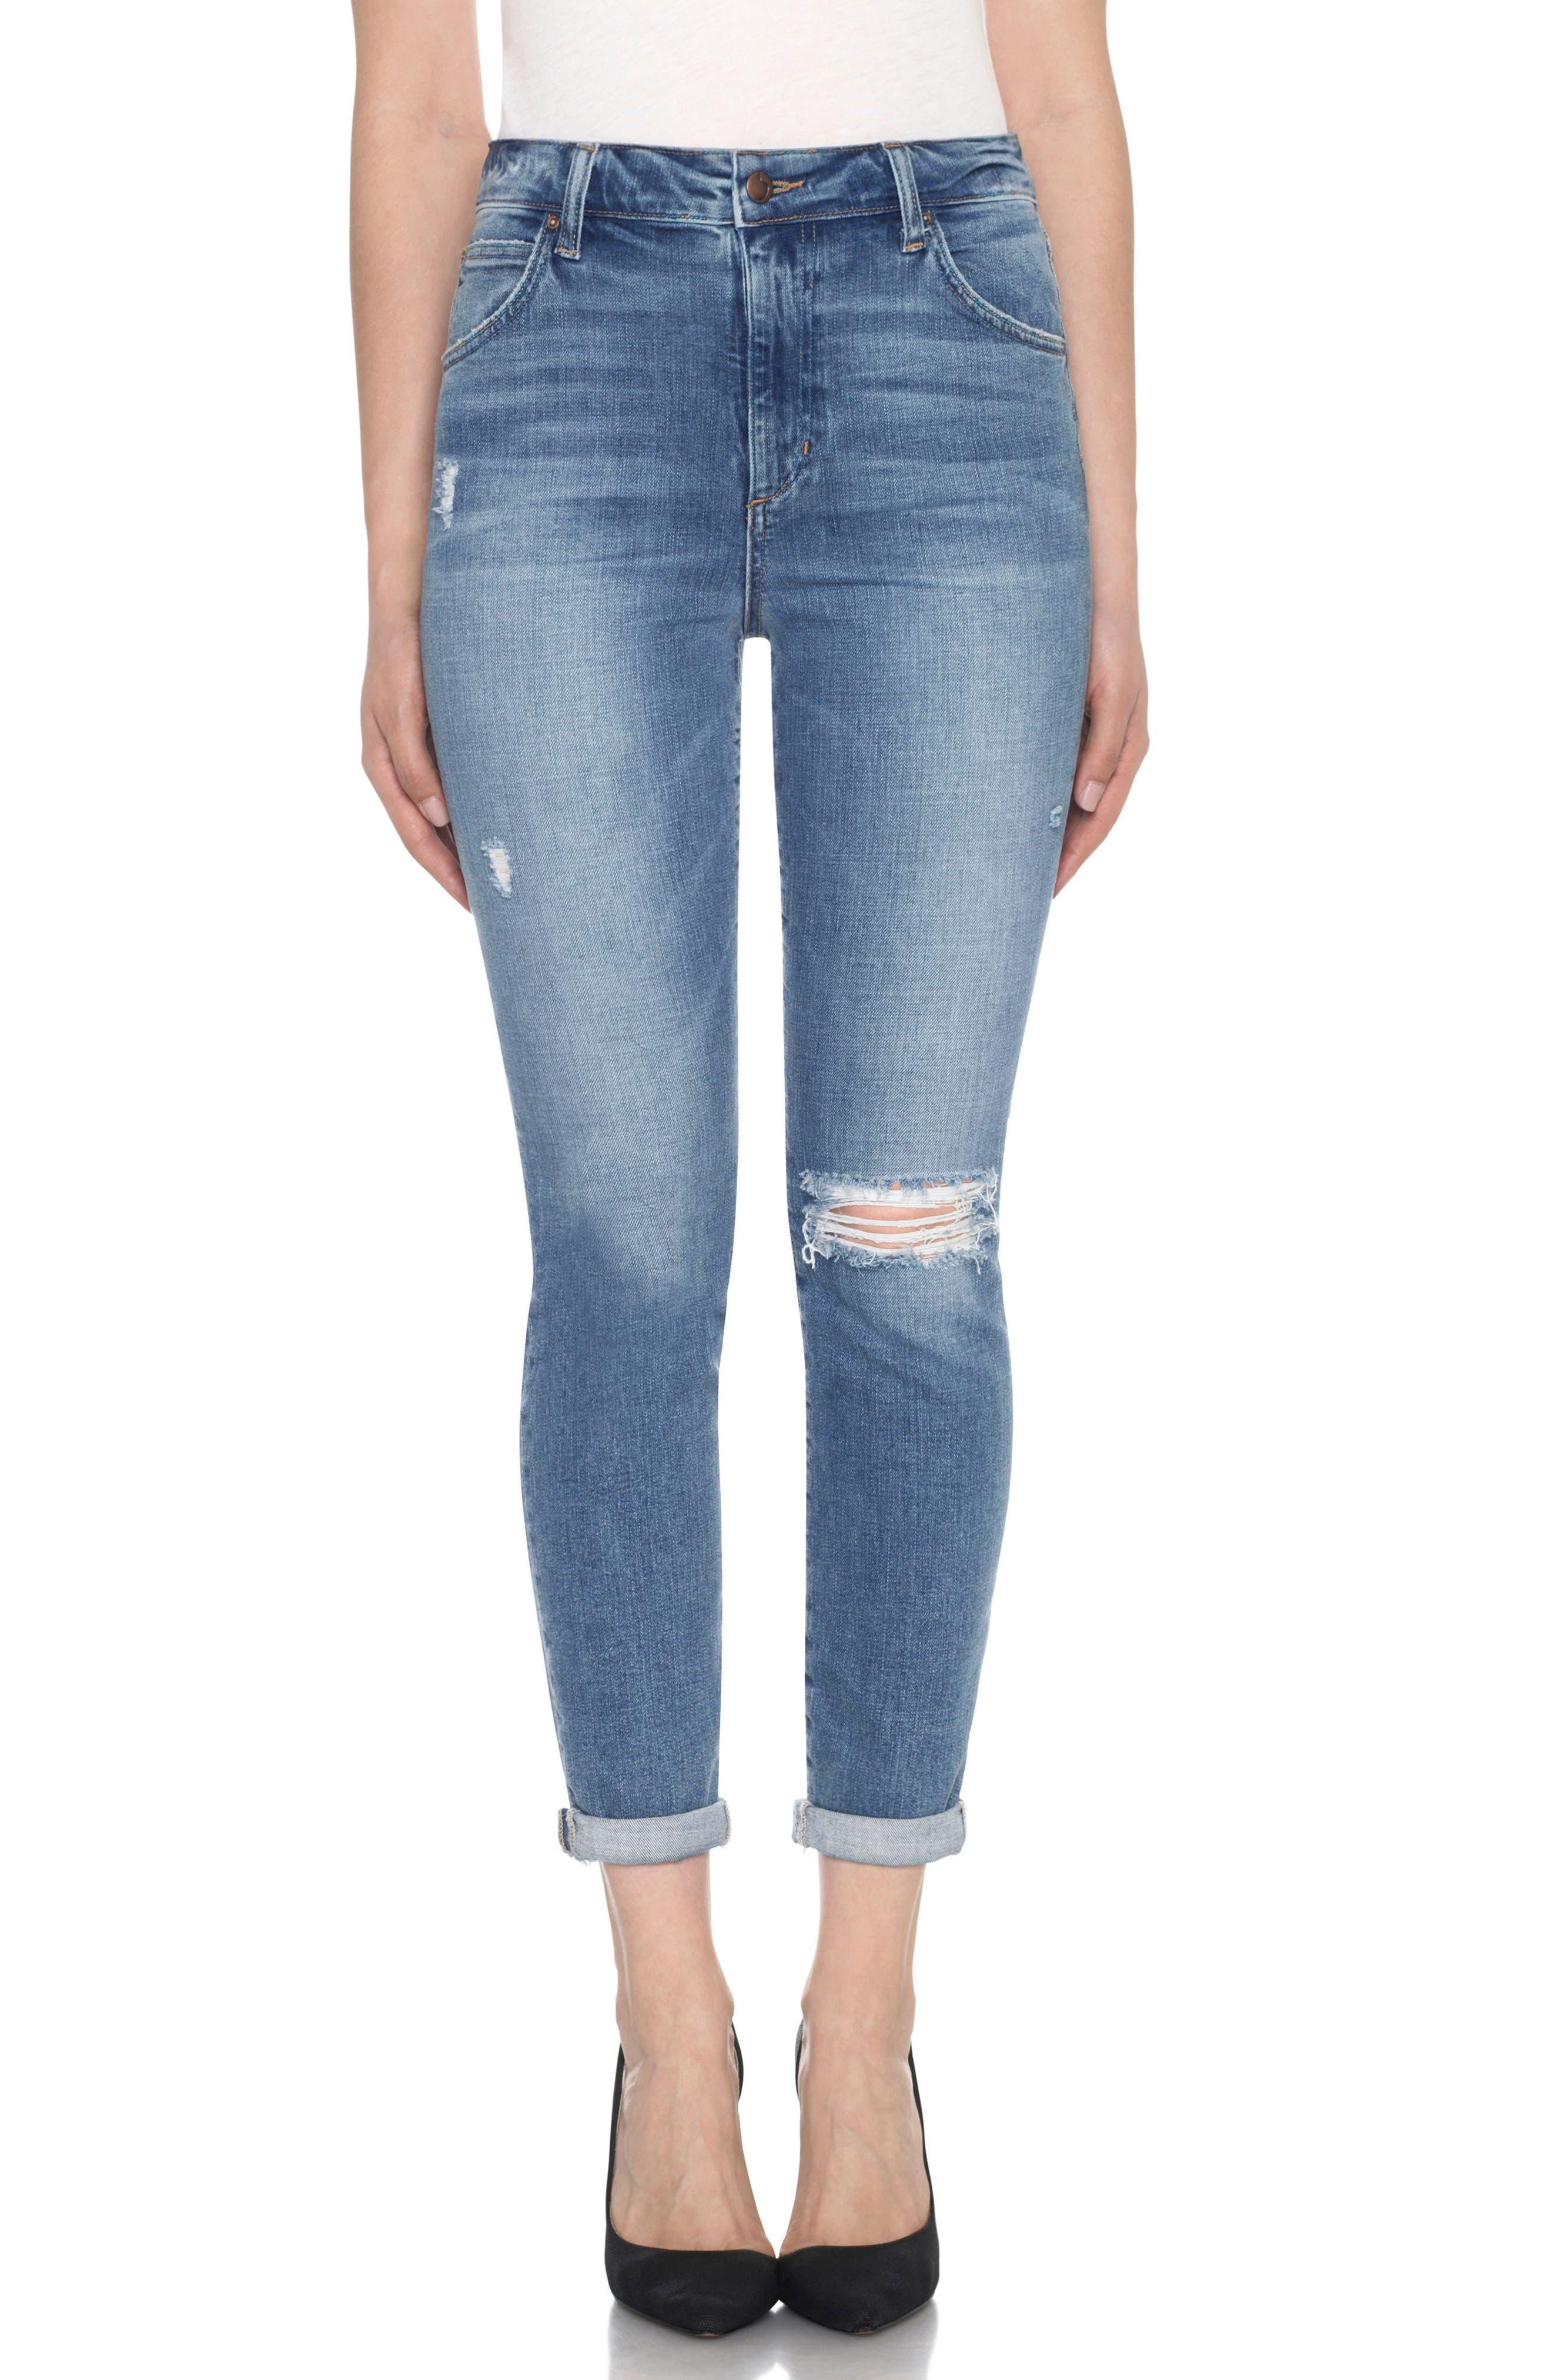 Alternate Image 1 Selected - Joe's Bella High Waist Crop Skinny Jeans (Mailou)